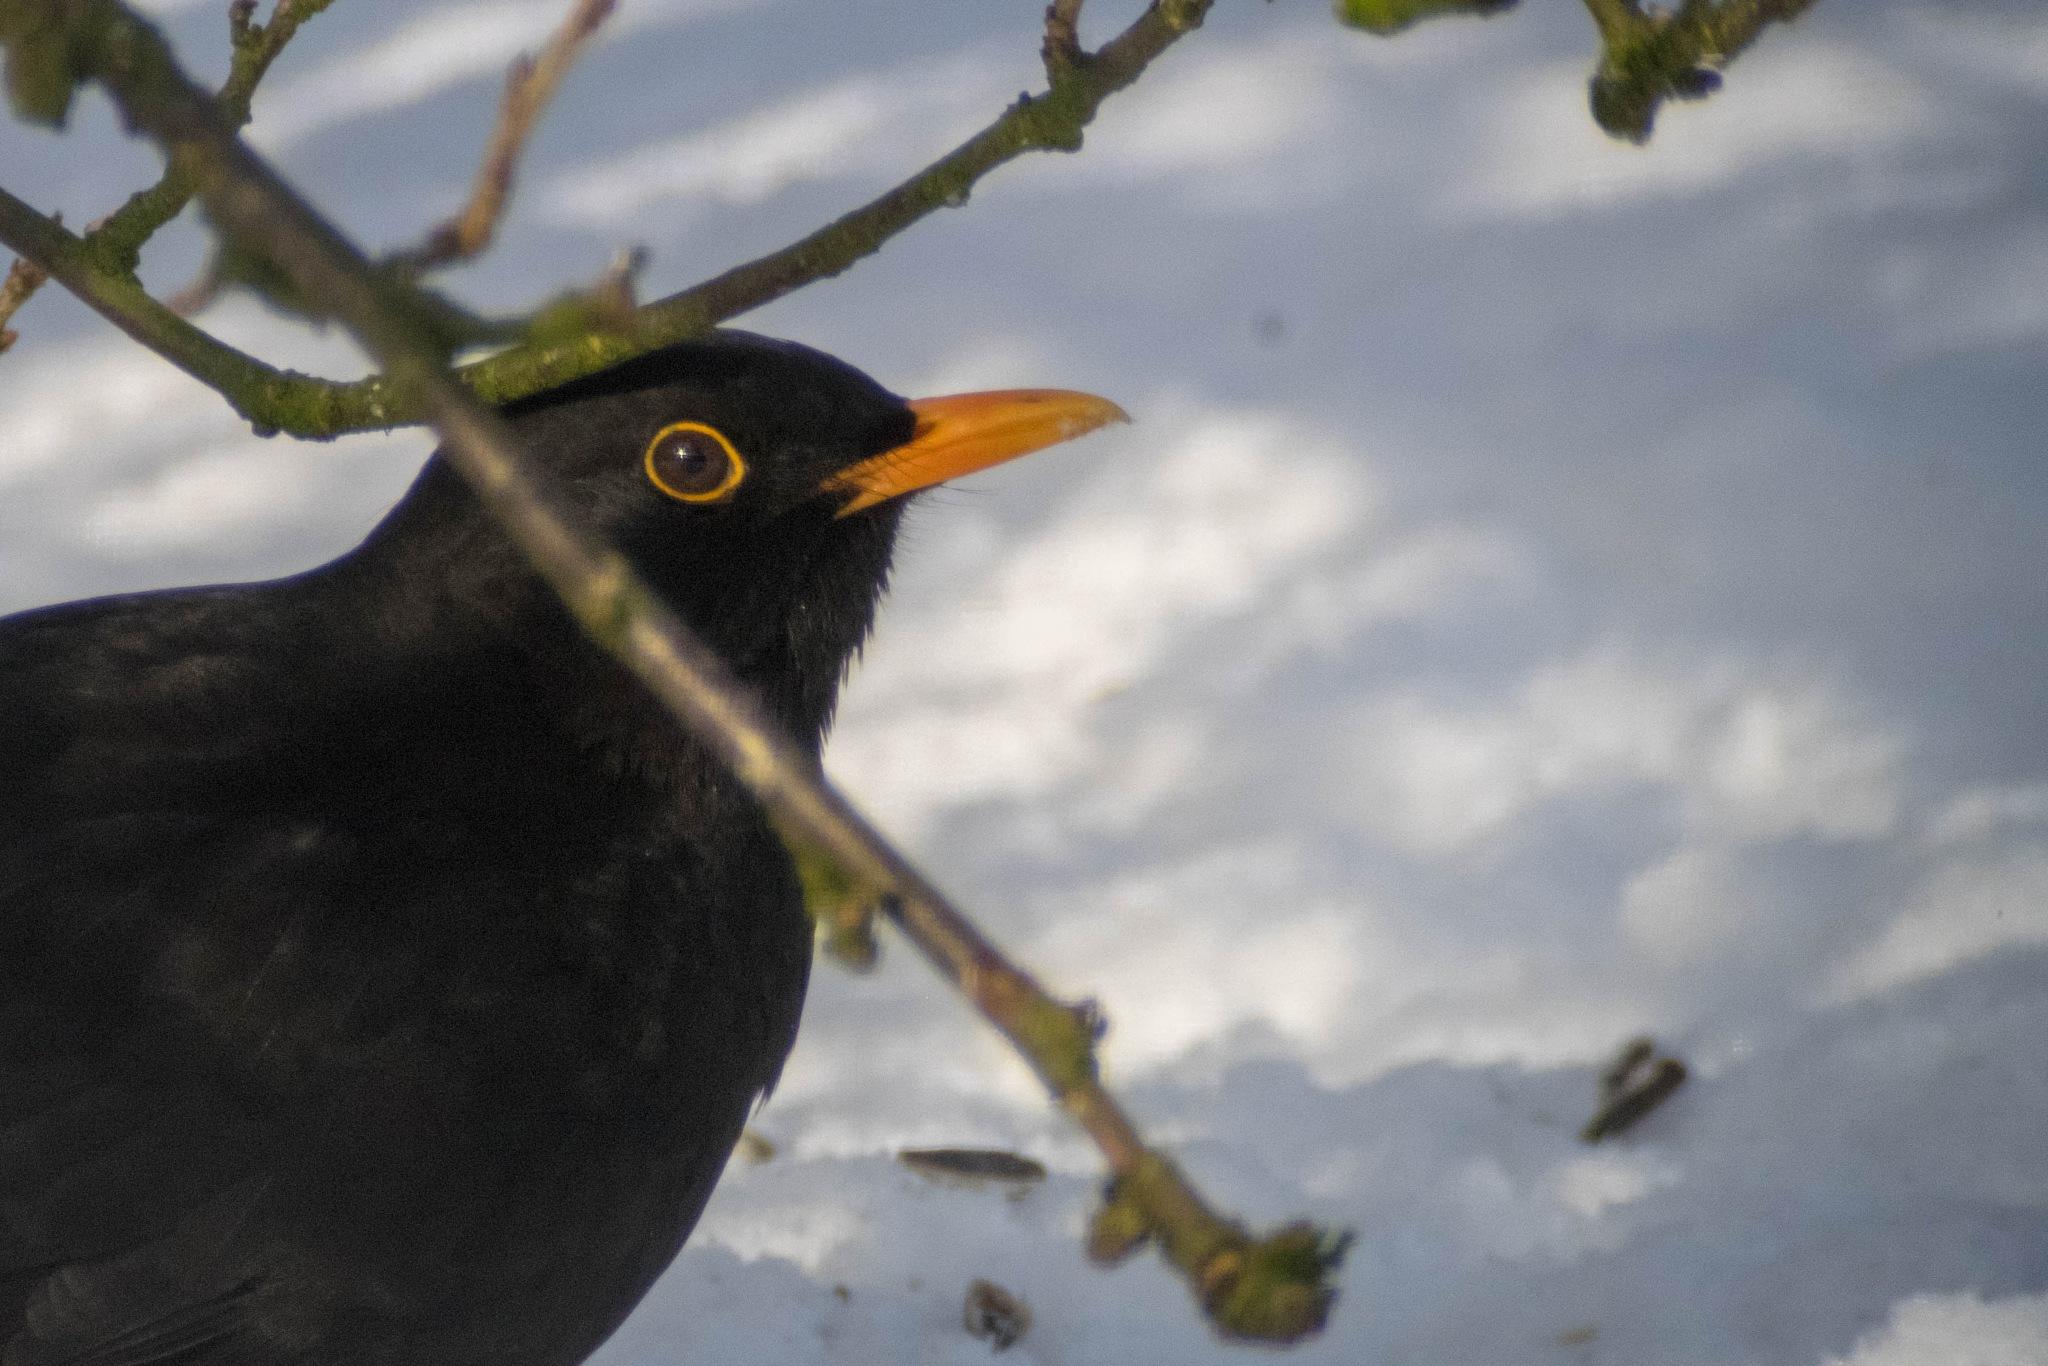 Blackbird in the snow by Lennart Karlsson